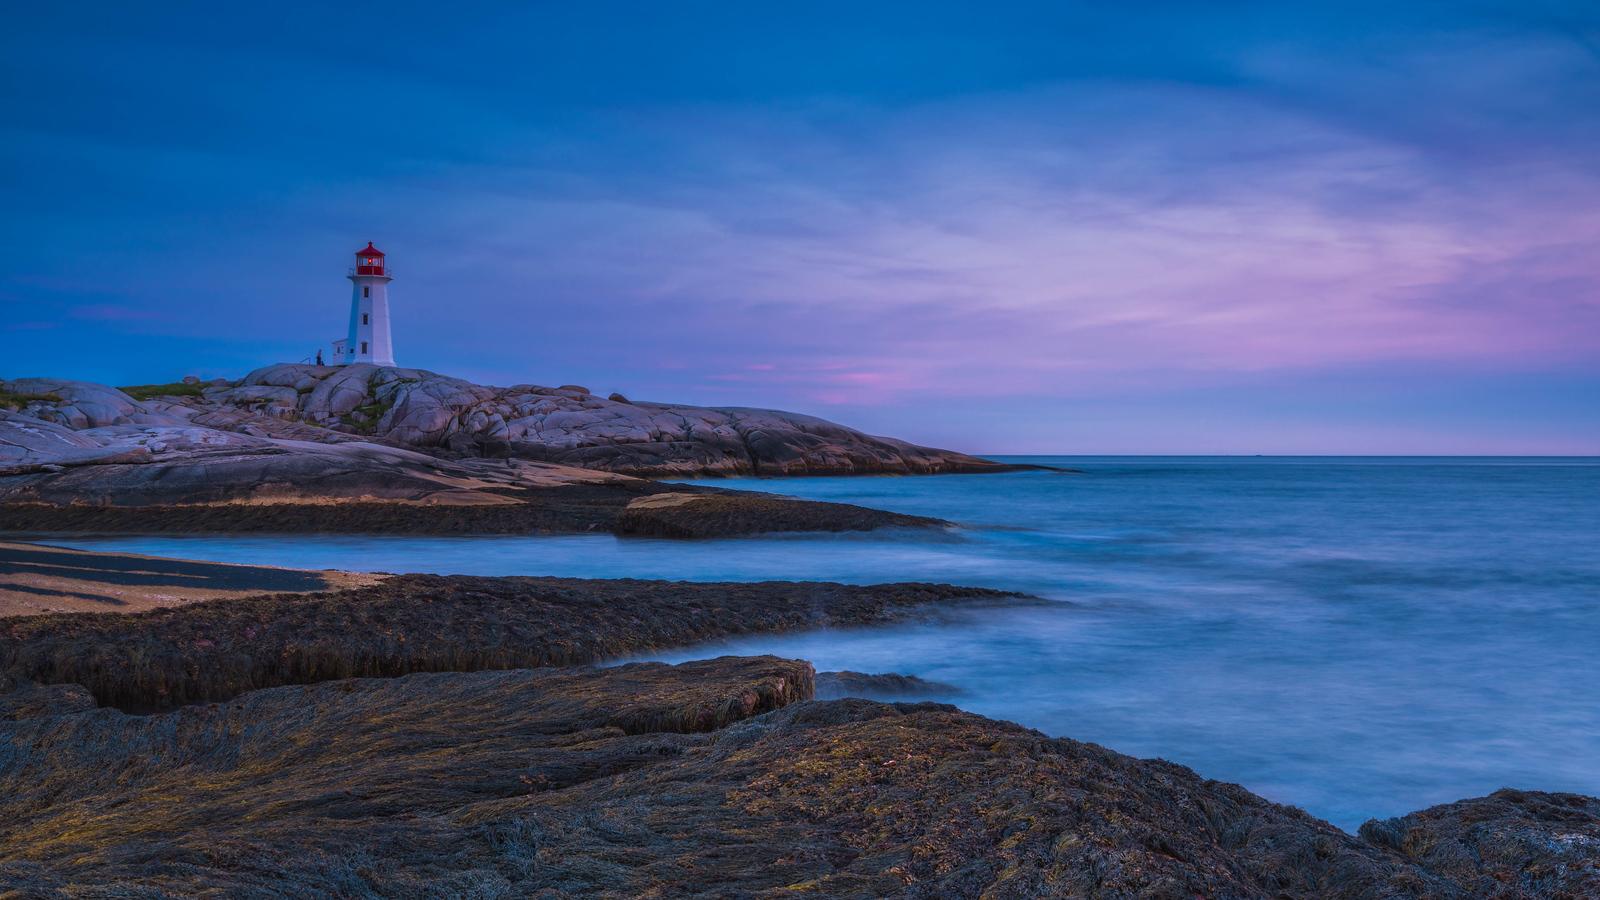 Sunset at Peggy's cove, Nova Scotia